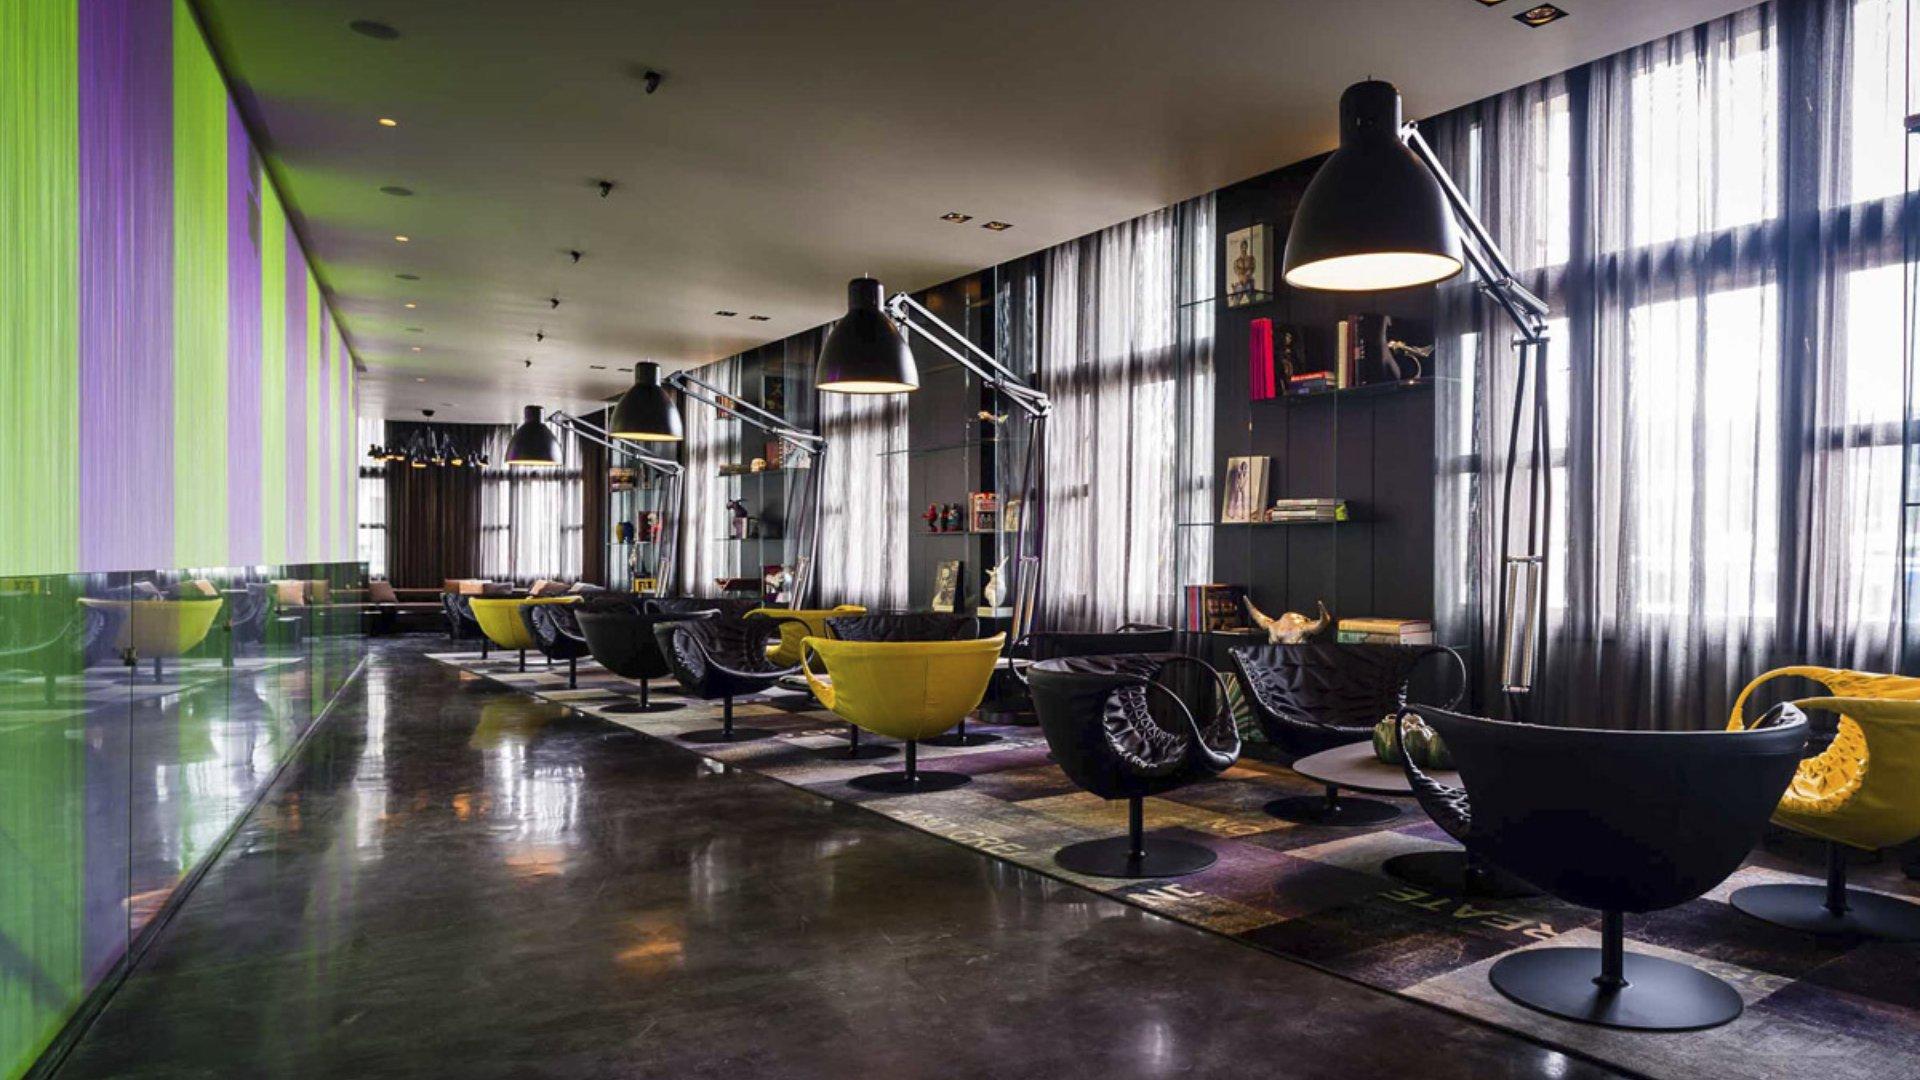 Art'otel Amsterdam modern hospitality design by Digital Space